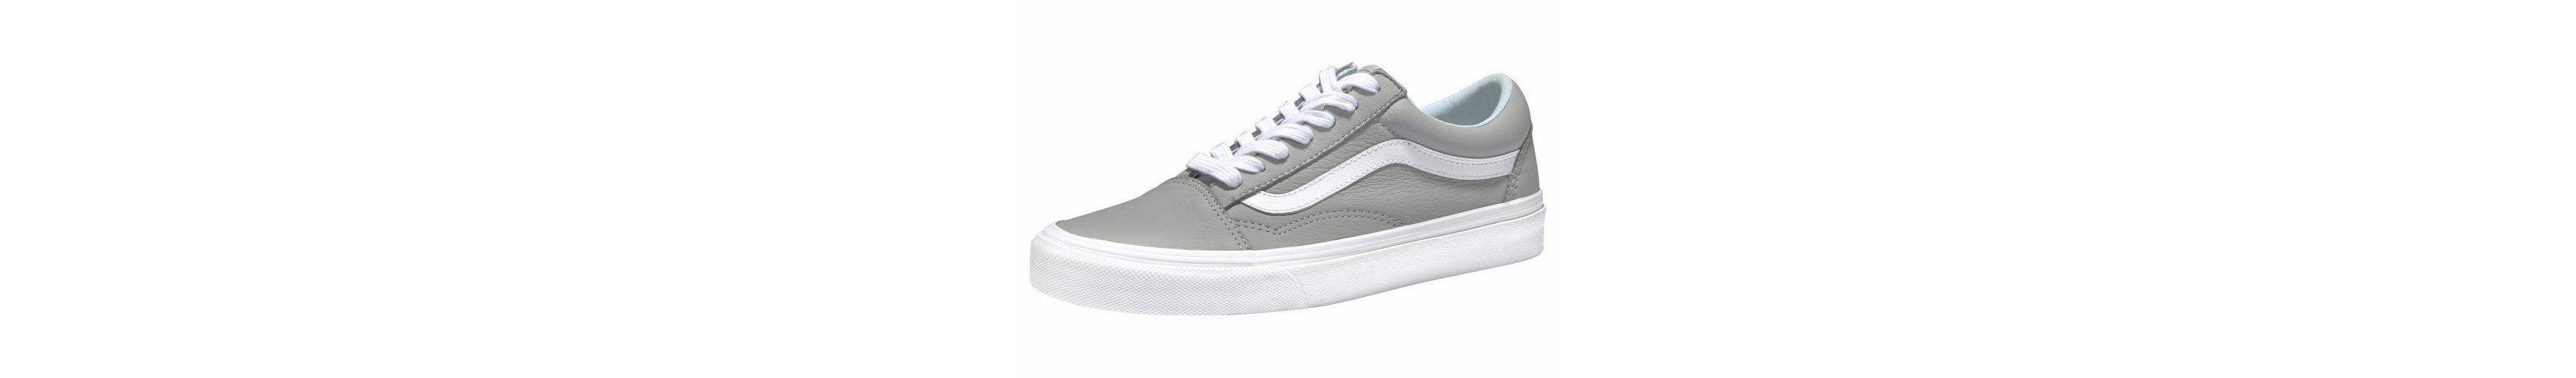 Vans Old Skook LTHR Wmn Sneaker